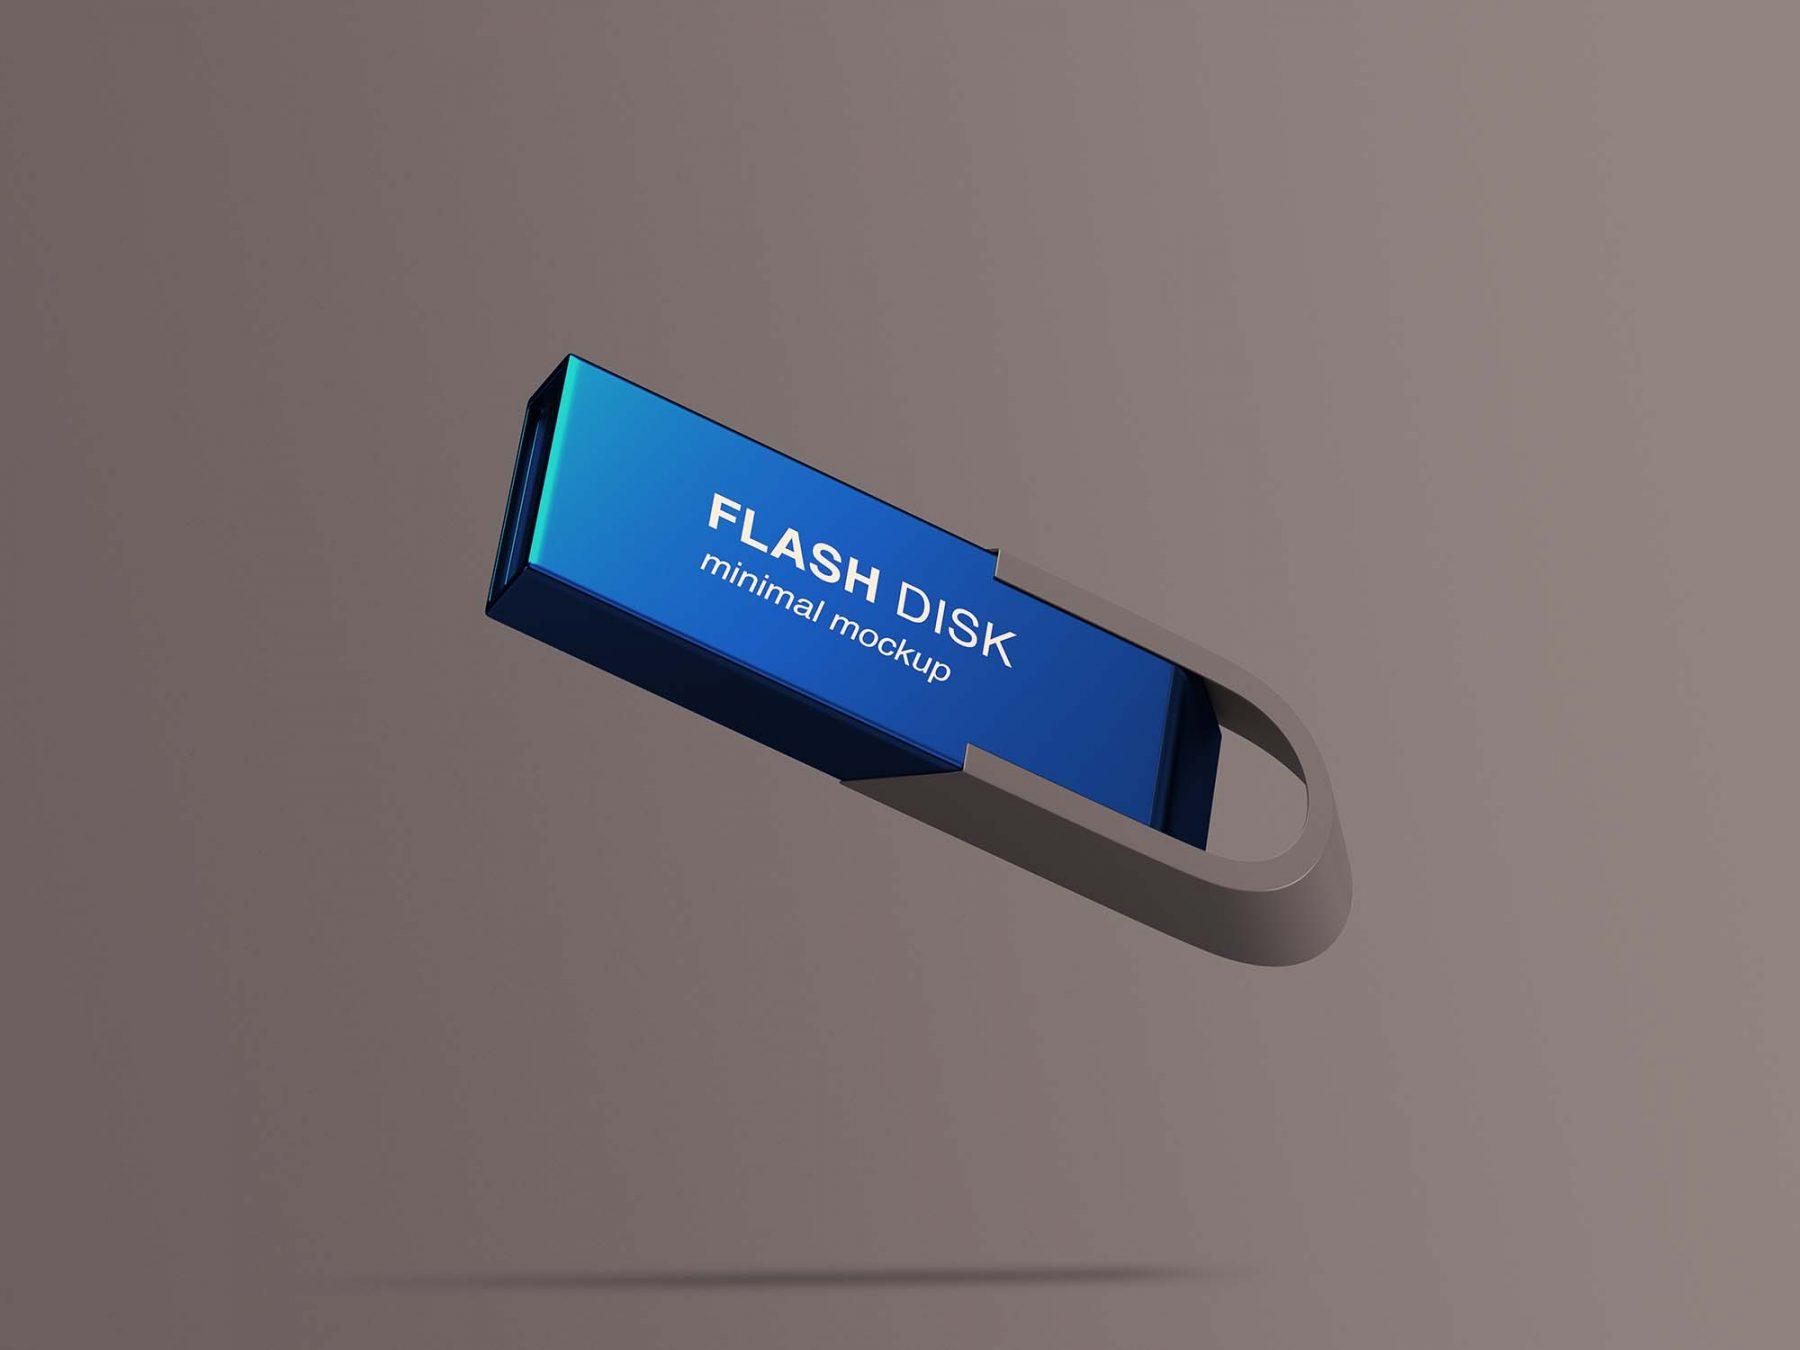 Free Flying Flash Disk Mockup